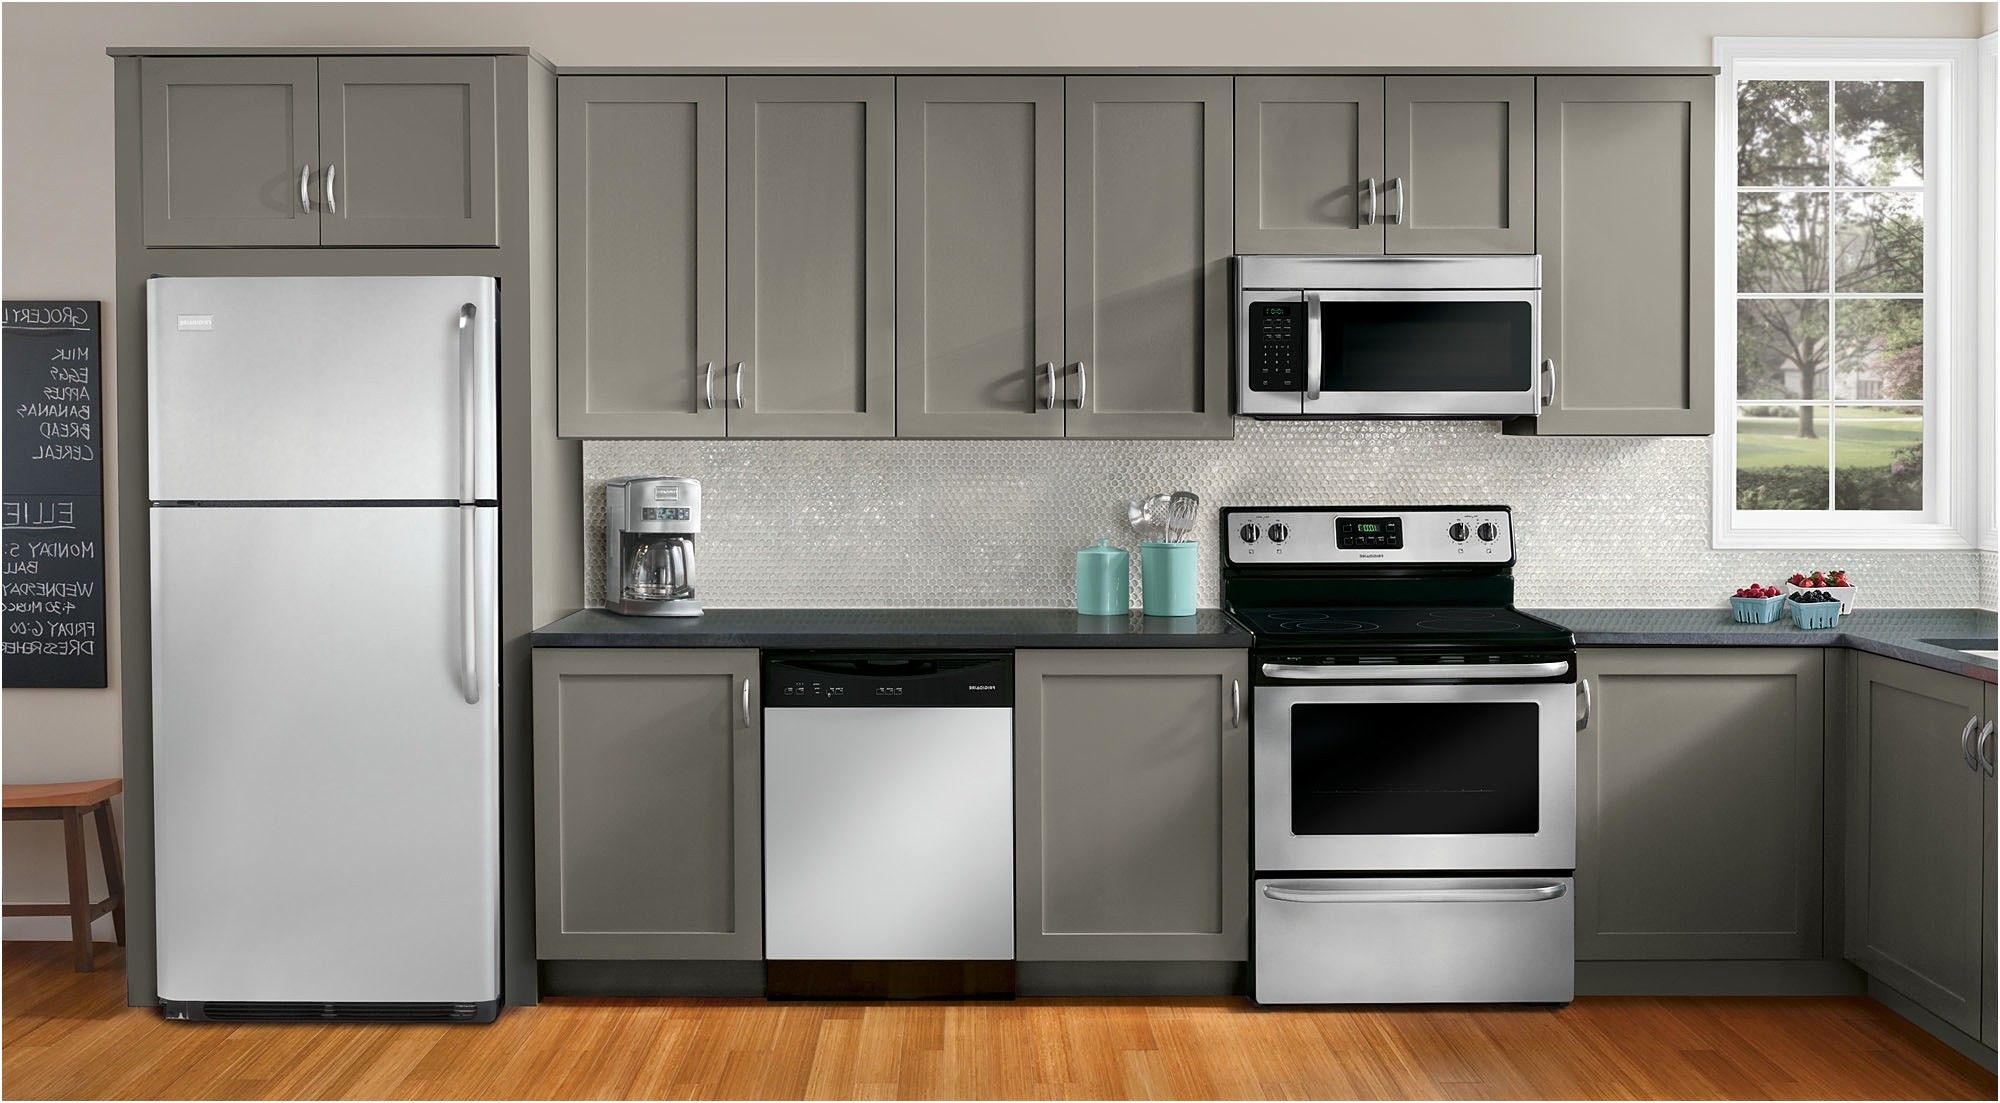 Delicieux Kitchen Appliances Package Deals Ireland Roselawnlutheran From Deals On Kitchen  Appliances